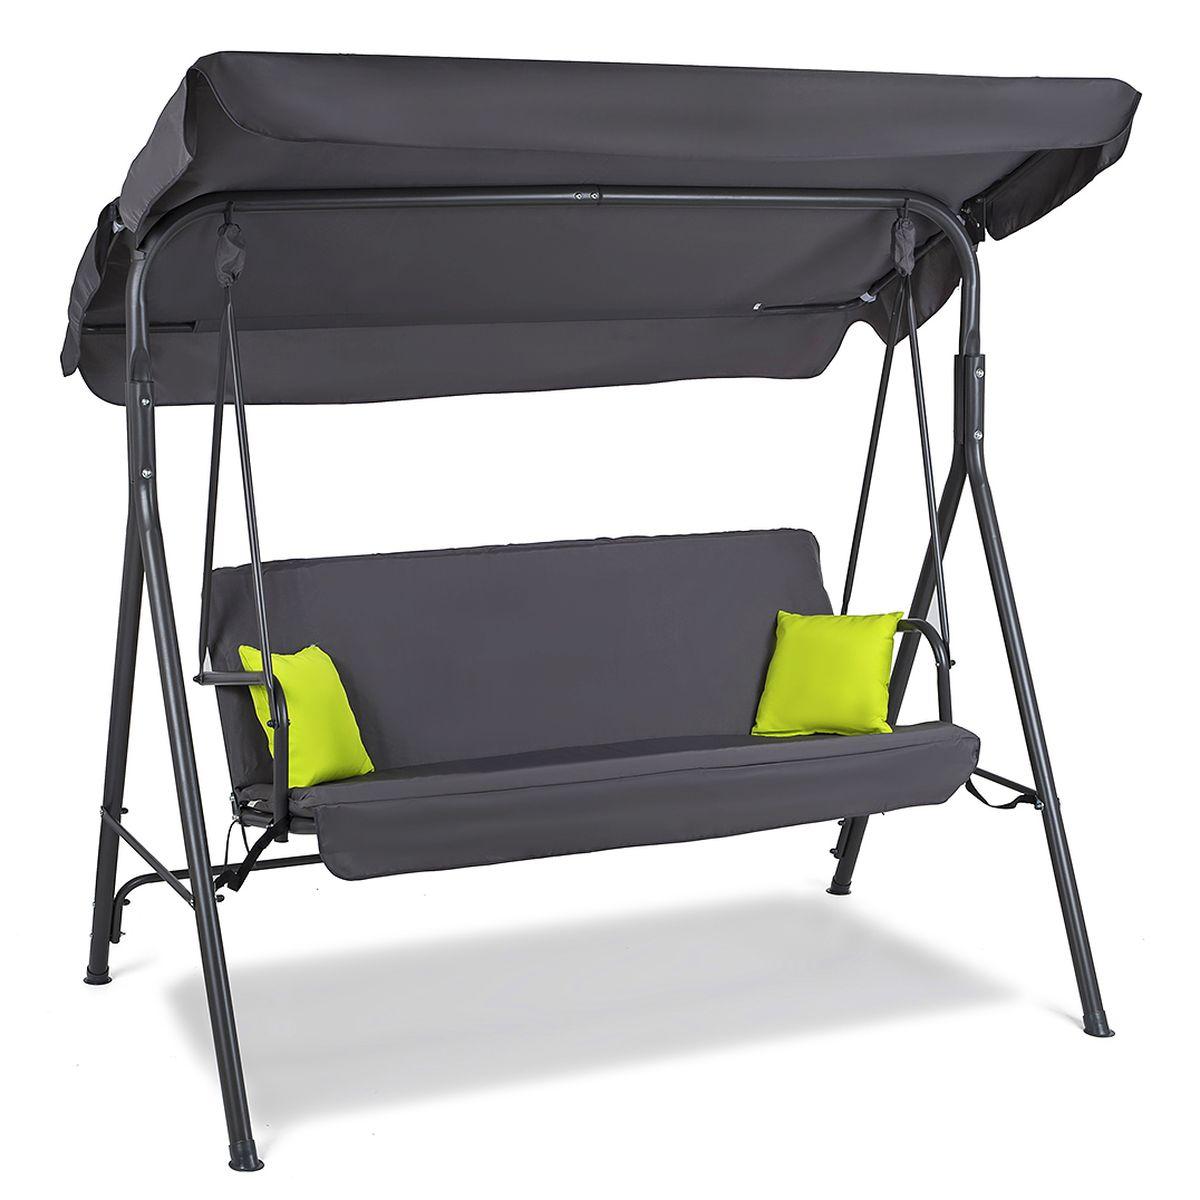 Swing Seat Garden Swing Swing Bench 3 Sitzer 2 Cushion Schadowline Plus Ebay